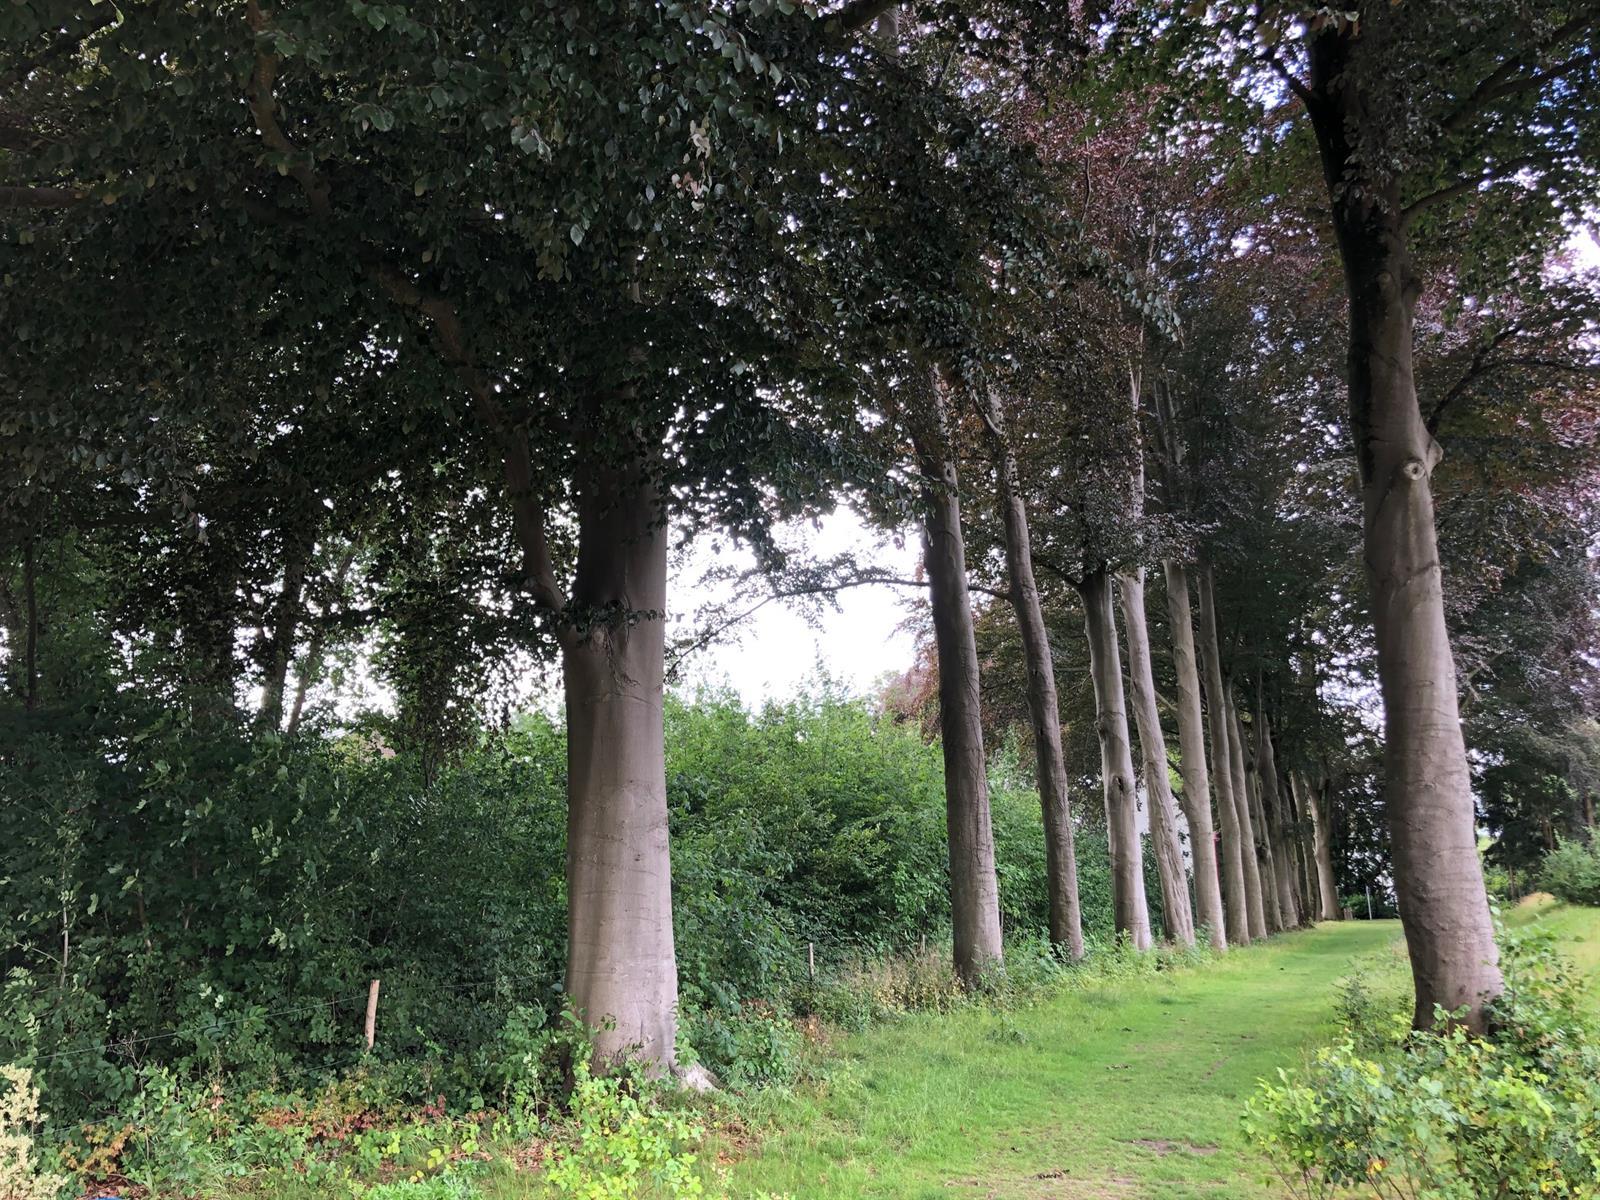 Terrain à bâtir - Ottignies-Louvain-la-Neuve - #4092046-2